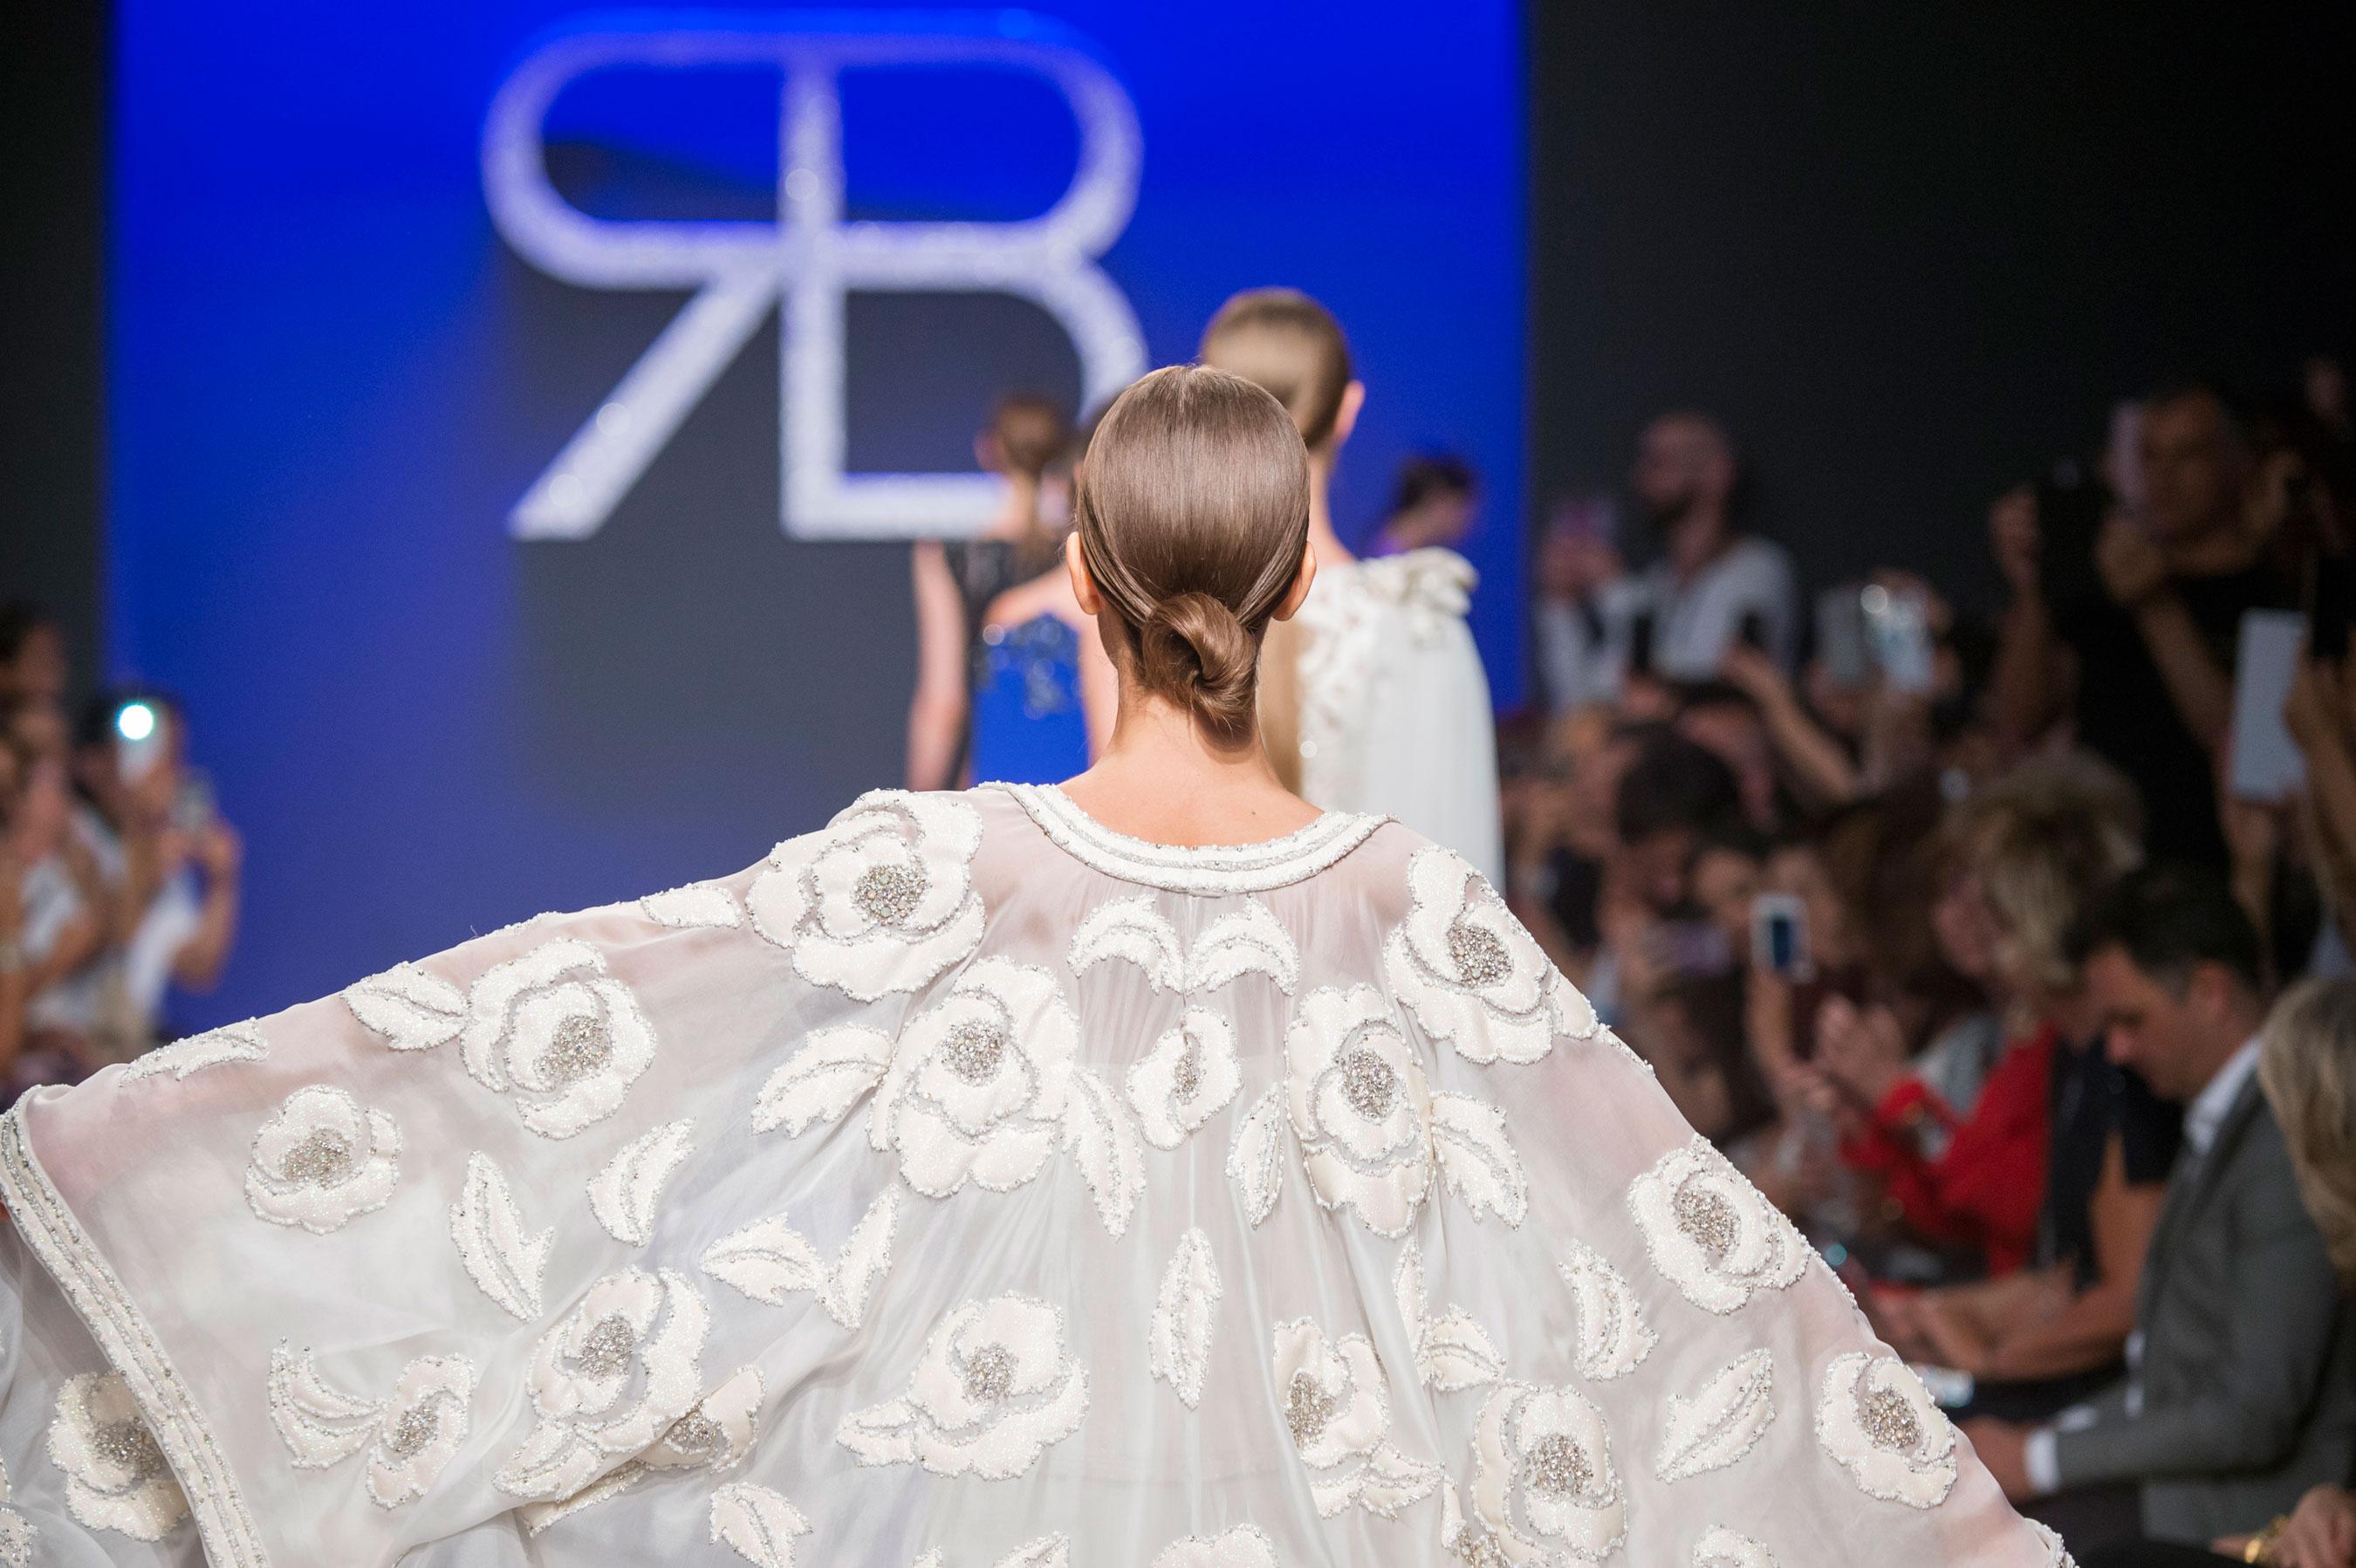 Balestra AR RF16 3146